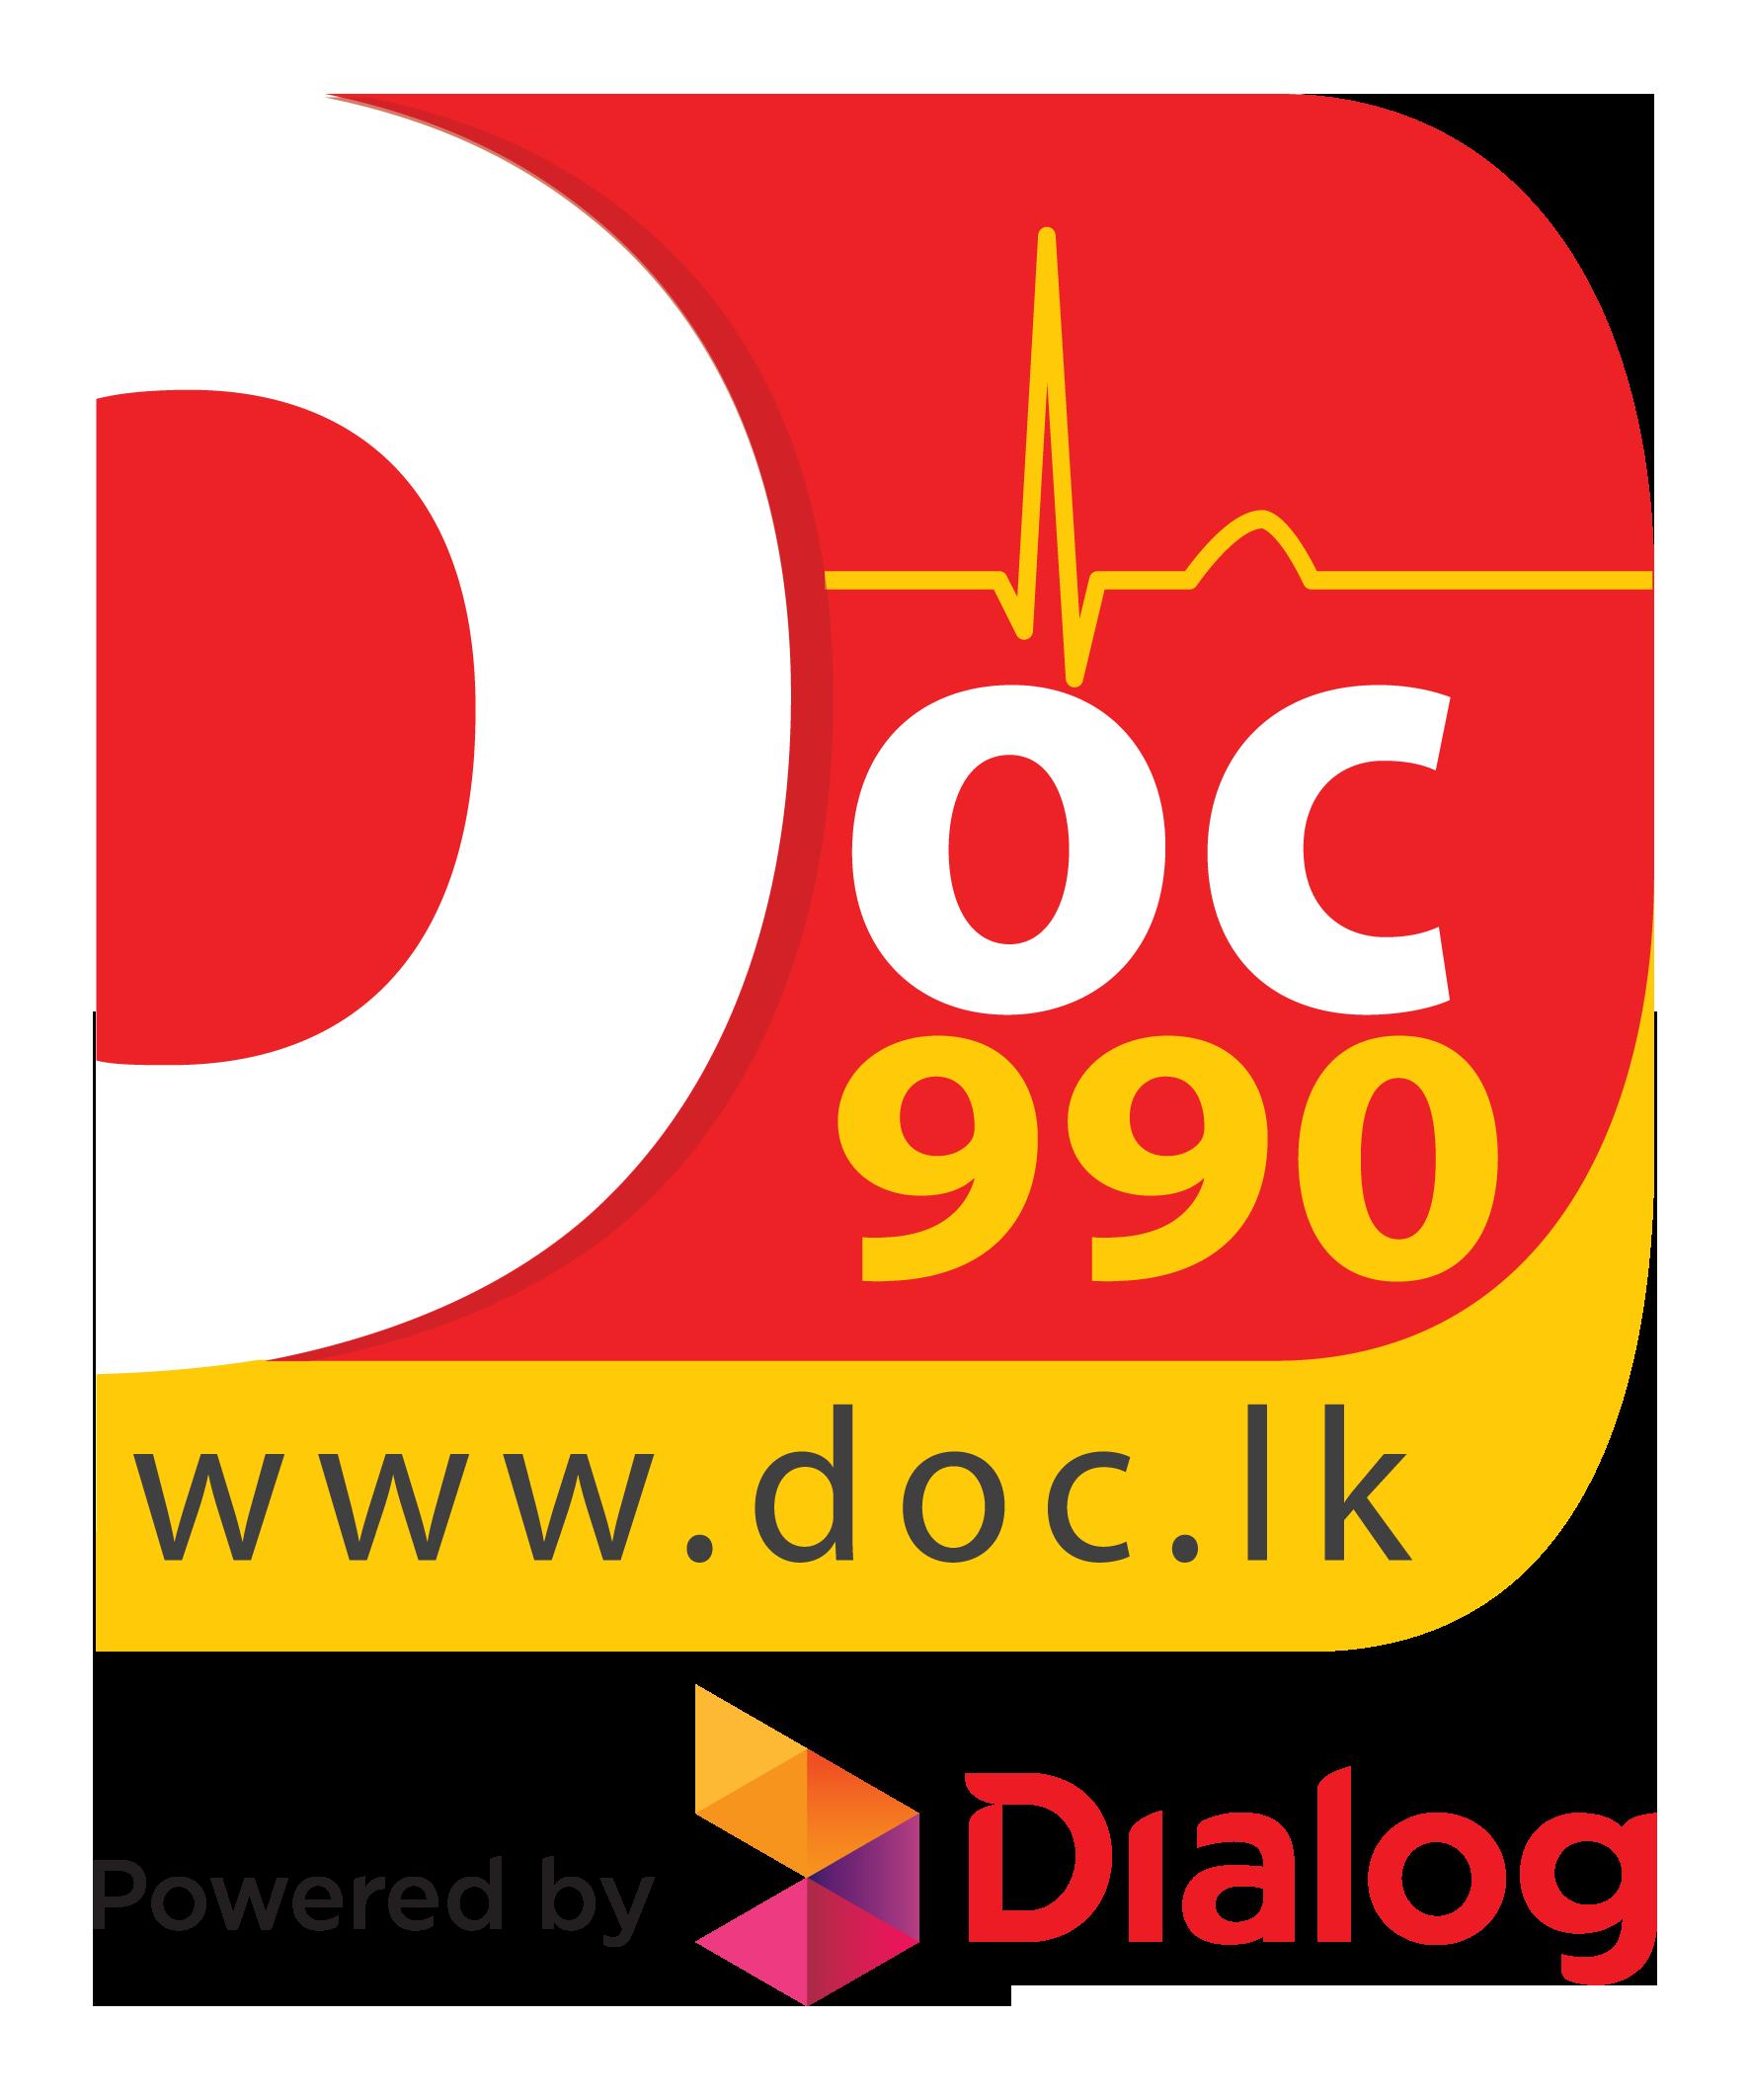 Doc990 Brand Logo